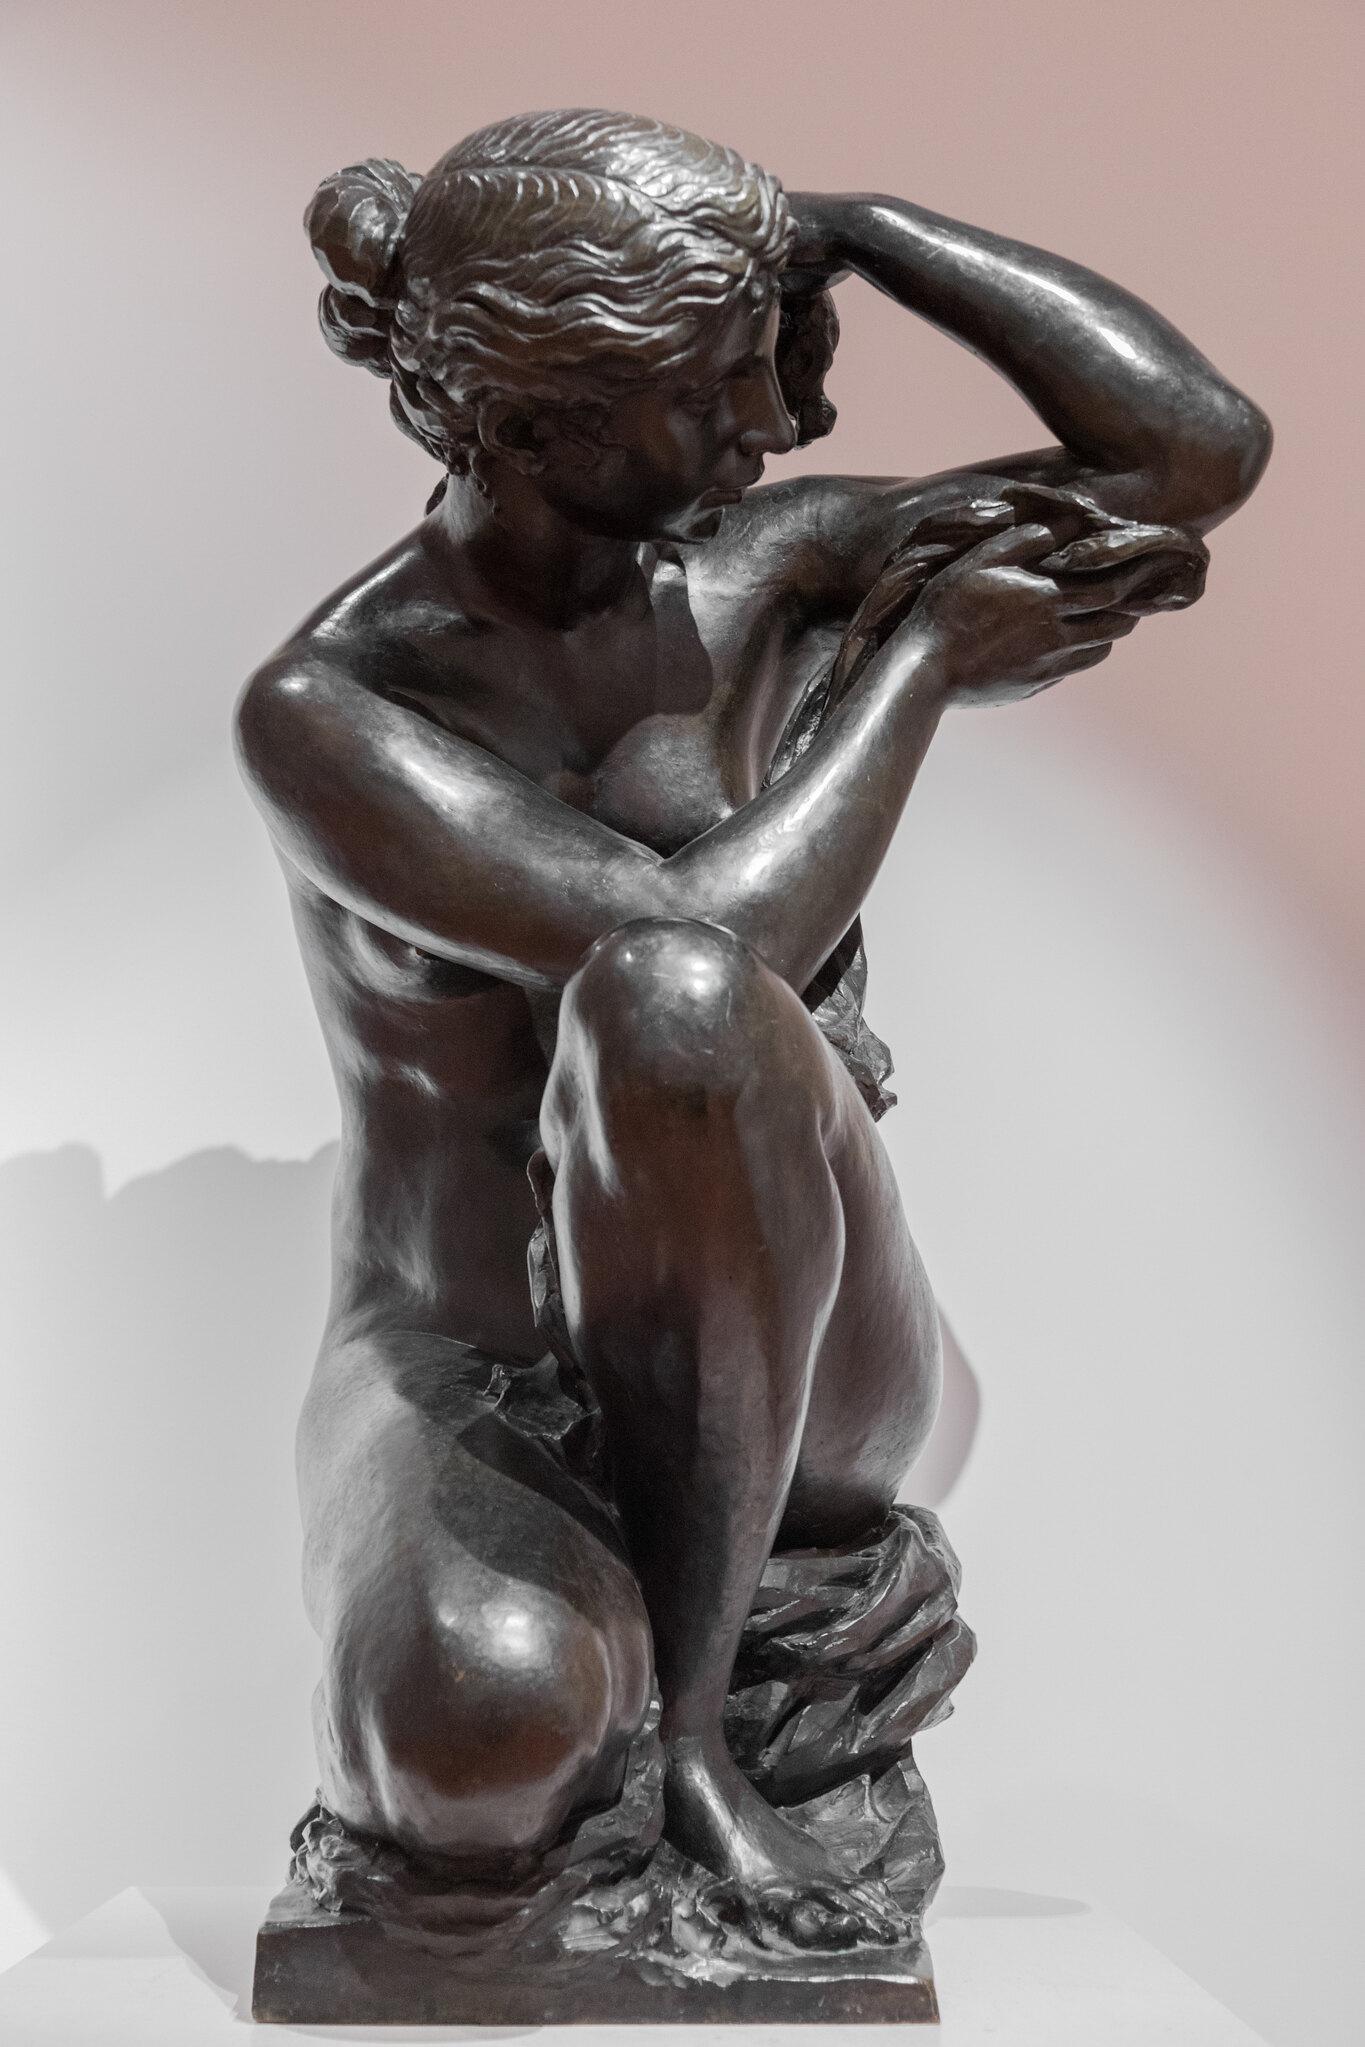 Grande Baigneuse, ou Femme agenouillée à sa toilette - Richard Guino, 1915